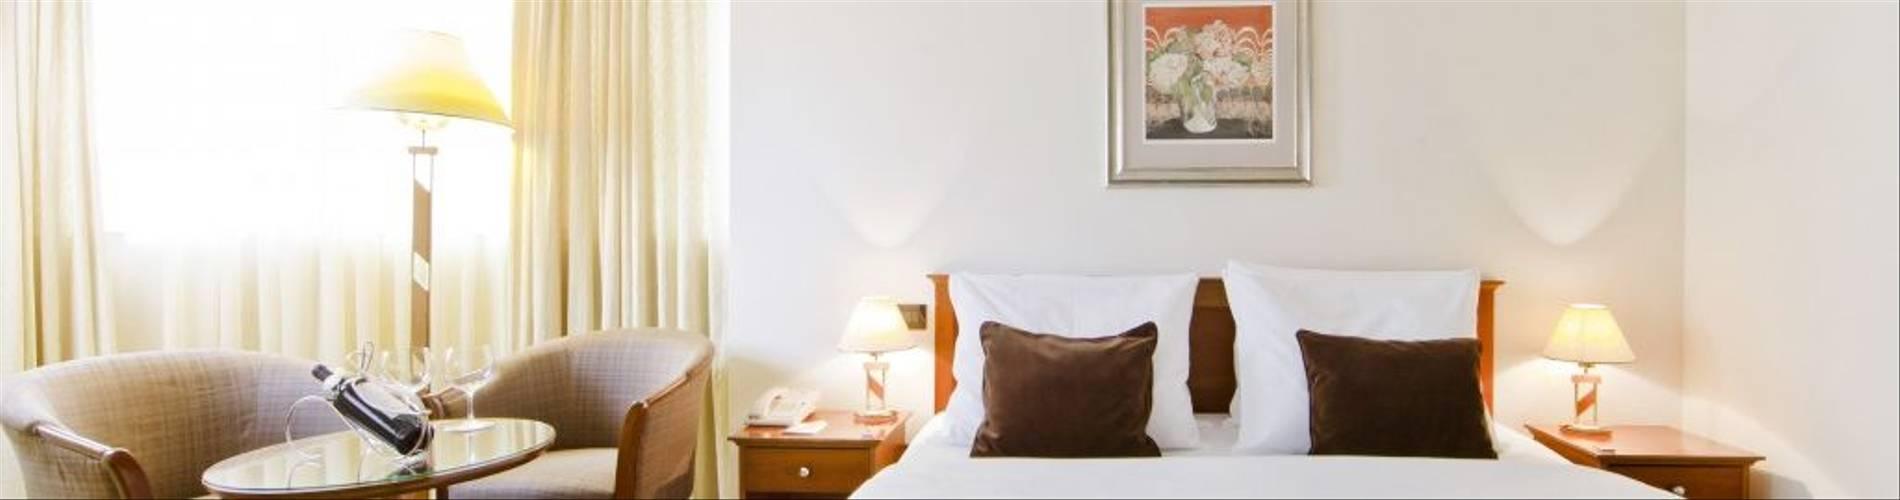 Standard-double-room-alt-Dubrovnik-Zagreb.jpg